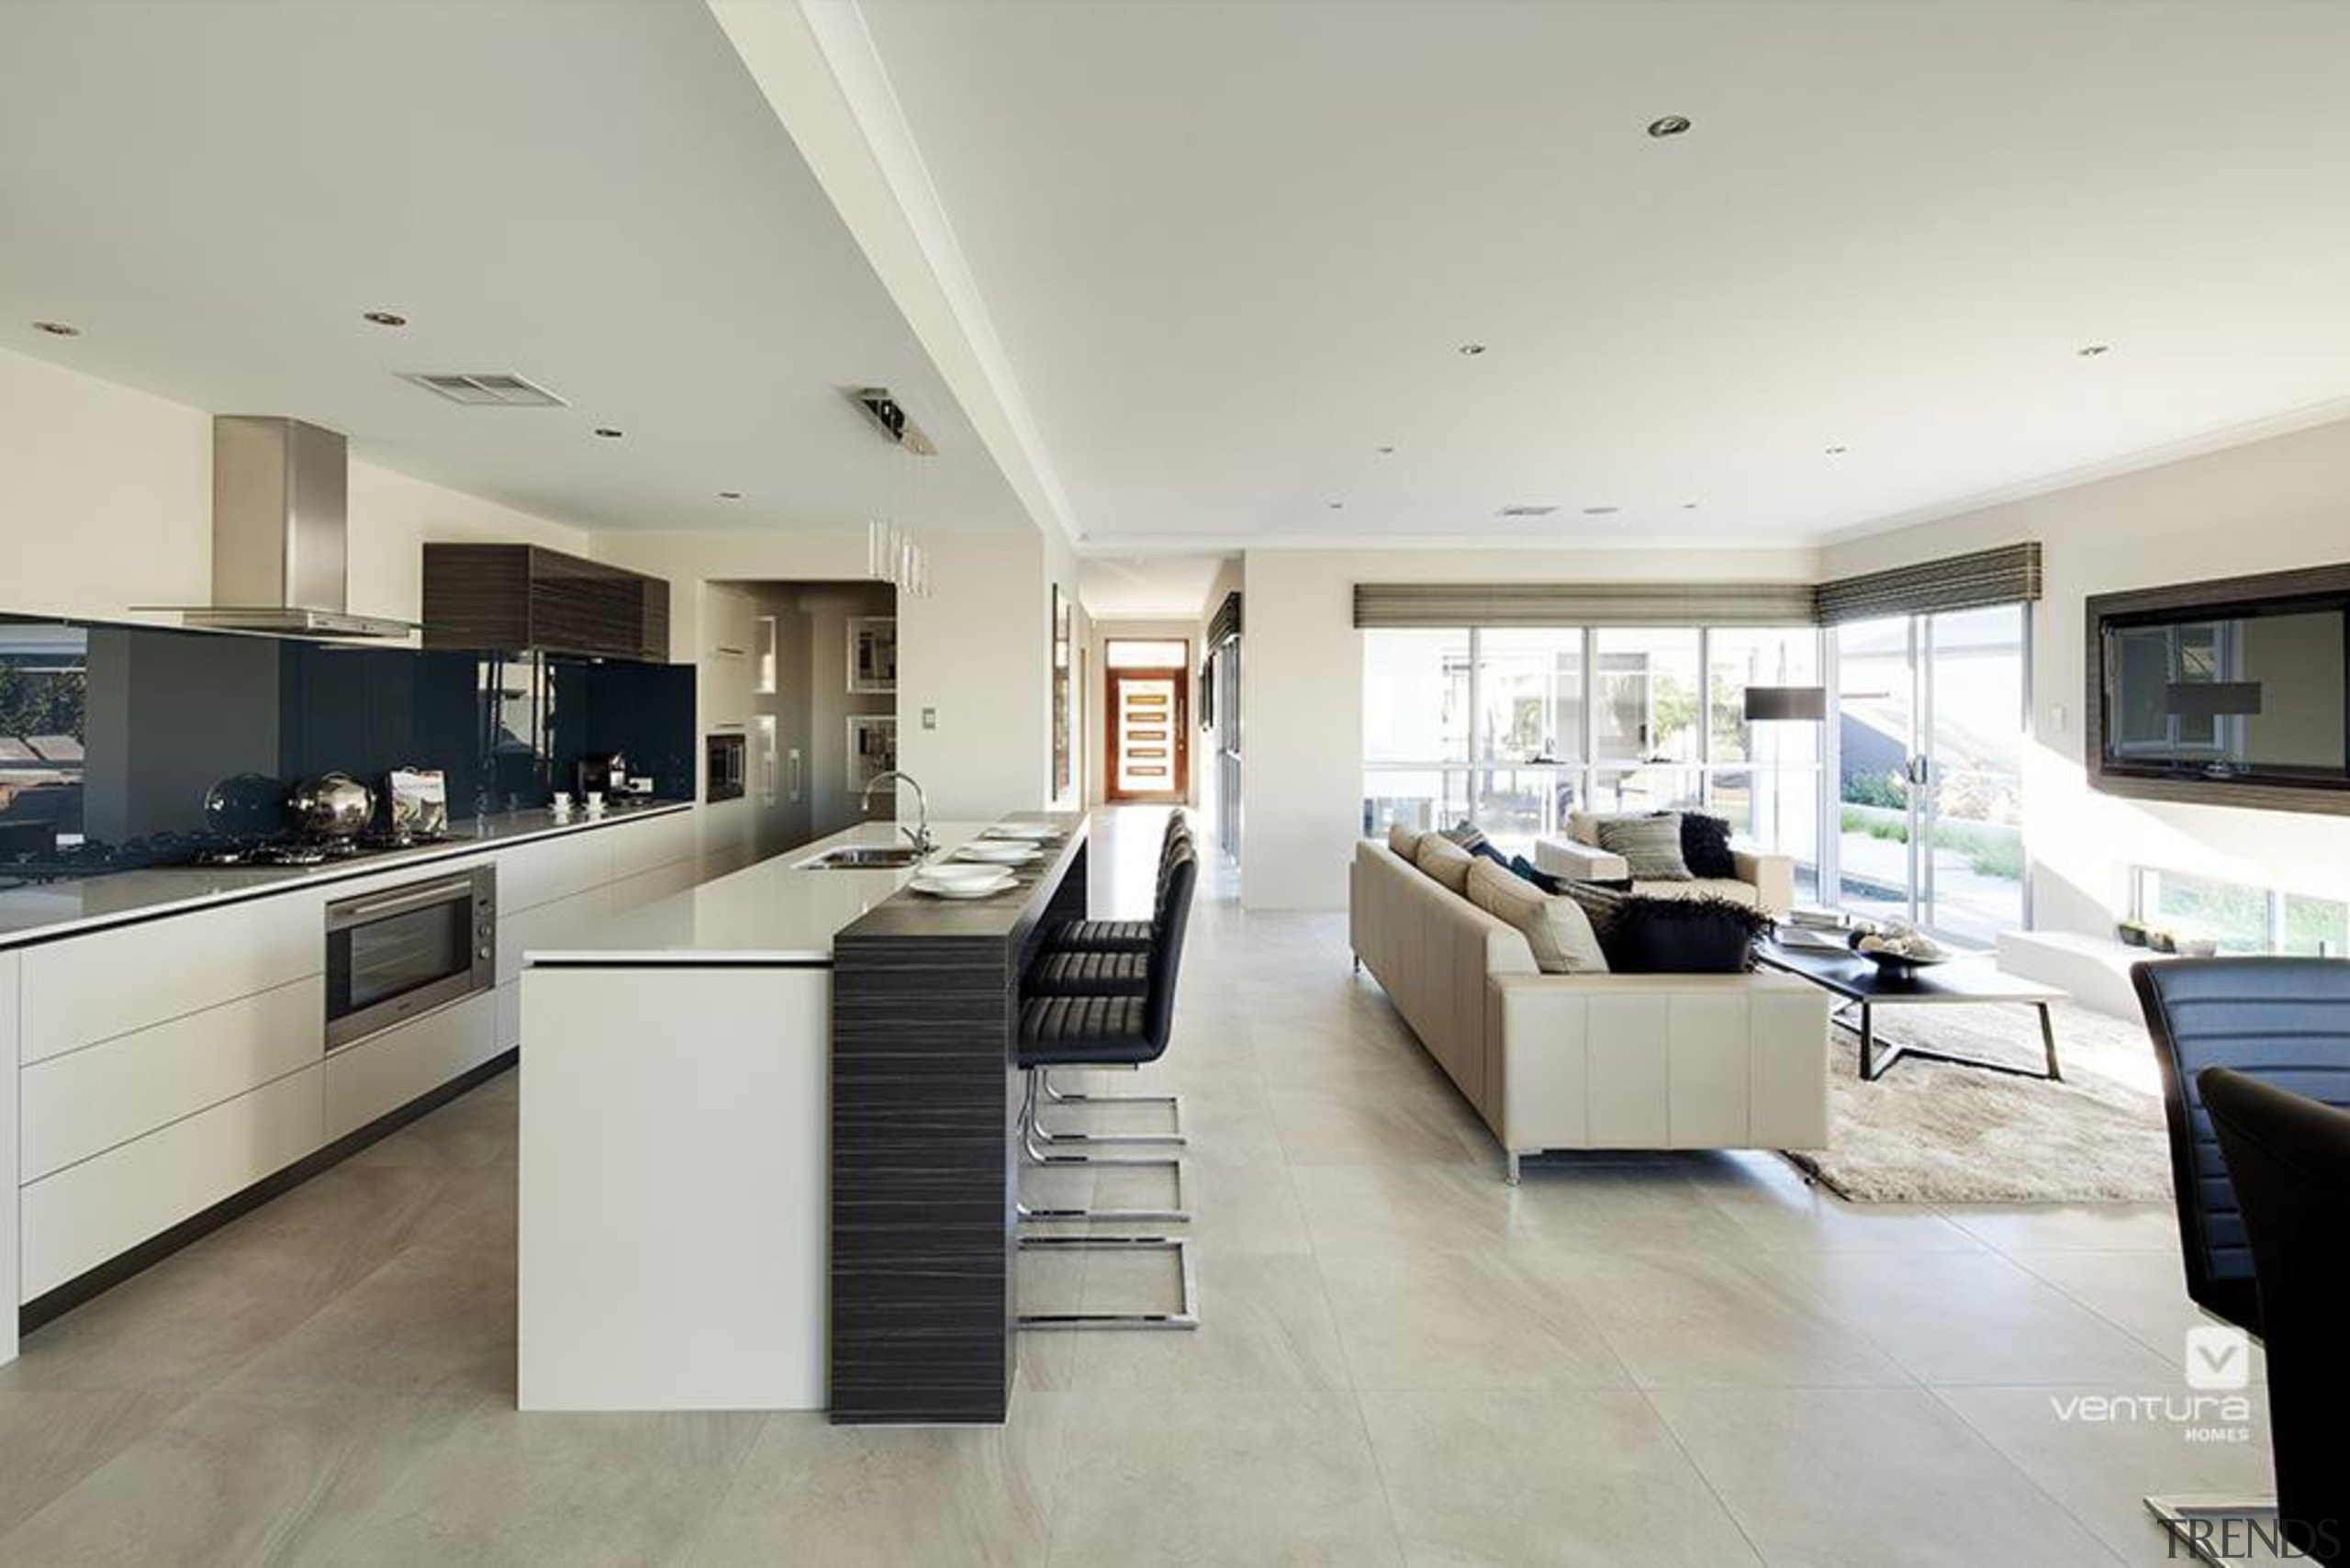 Kitchen design. - The Sentosa Display Home - floor, flooring, interior design, kitchen, living room, property, real estate, gray